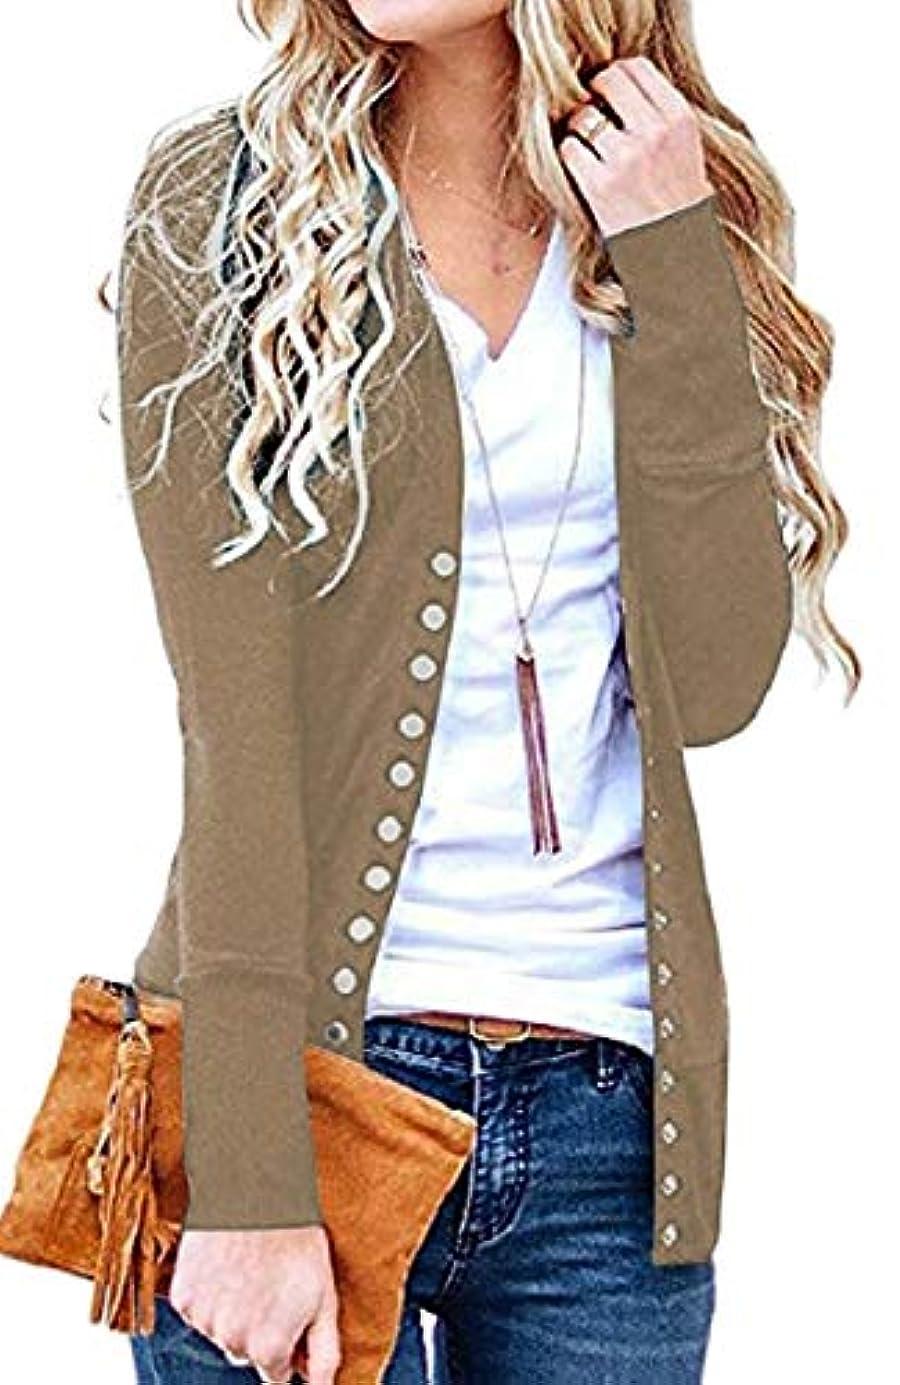 FLCH+YIGE Womens Casual Snap Button Front Knitwear Stretchy Slim Cardigan Jackets tajmba0363